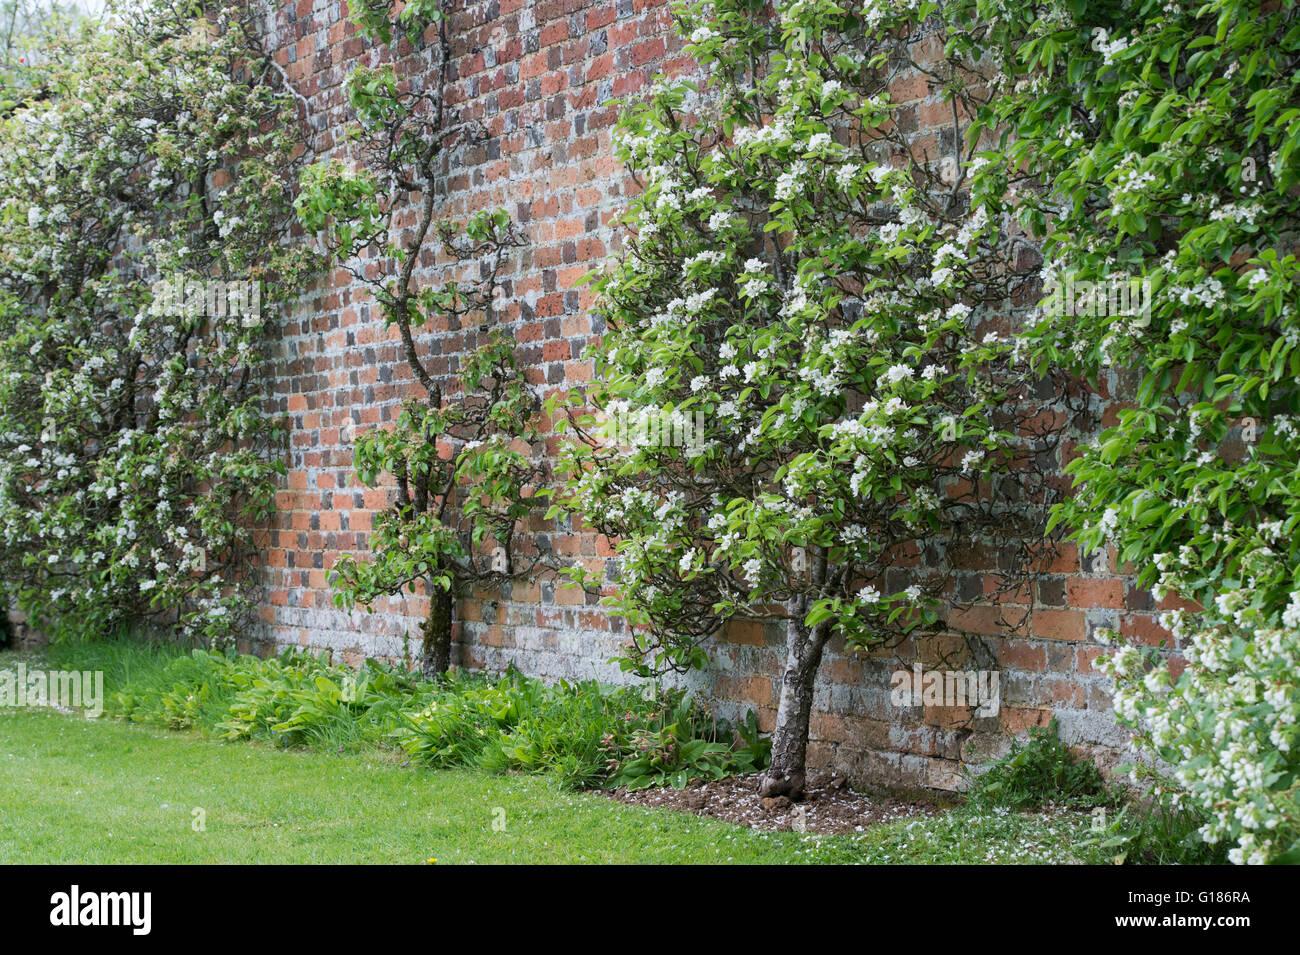 Espalier Garden Redux: Espalier Fruit Trees In Blossom Against The Walled Garden